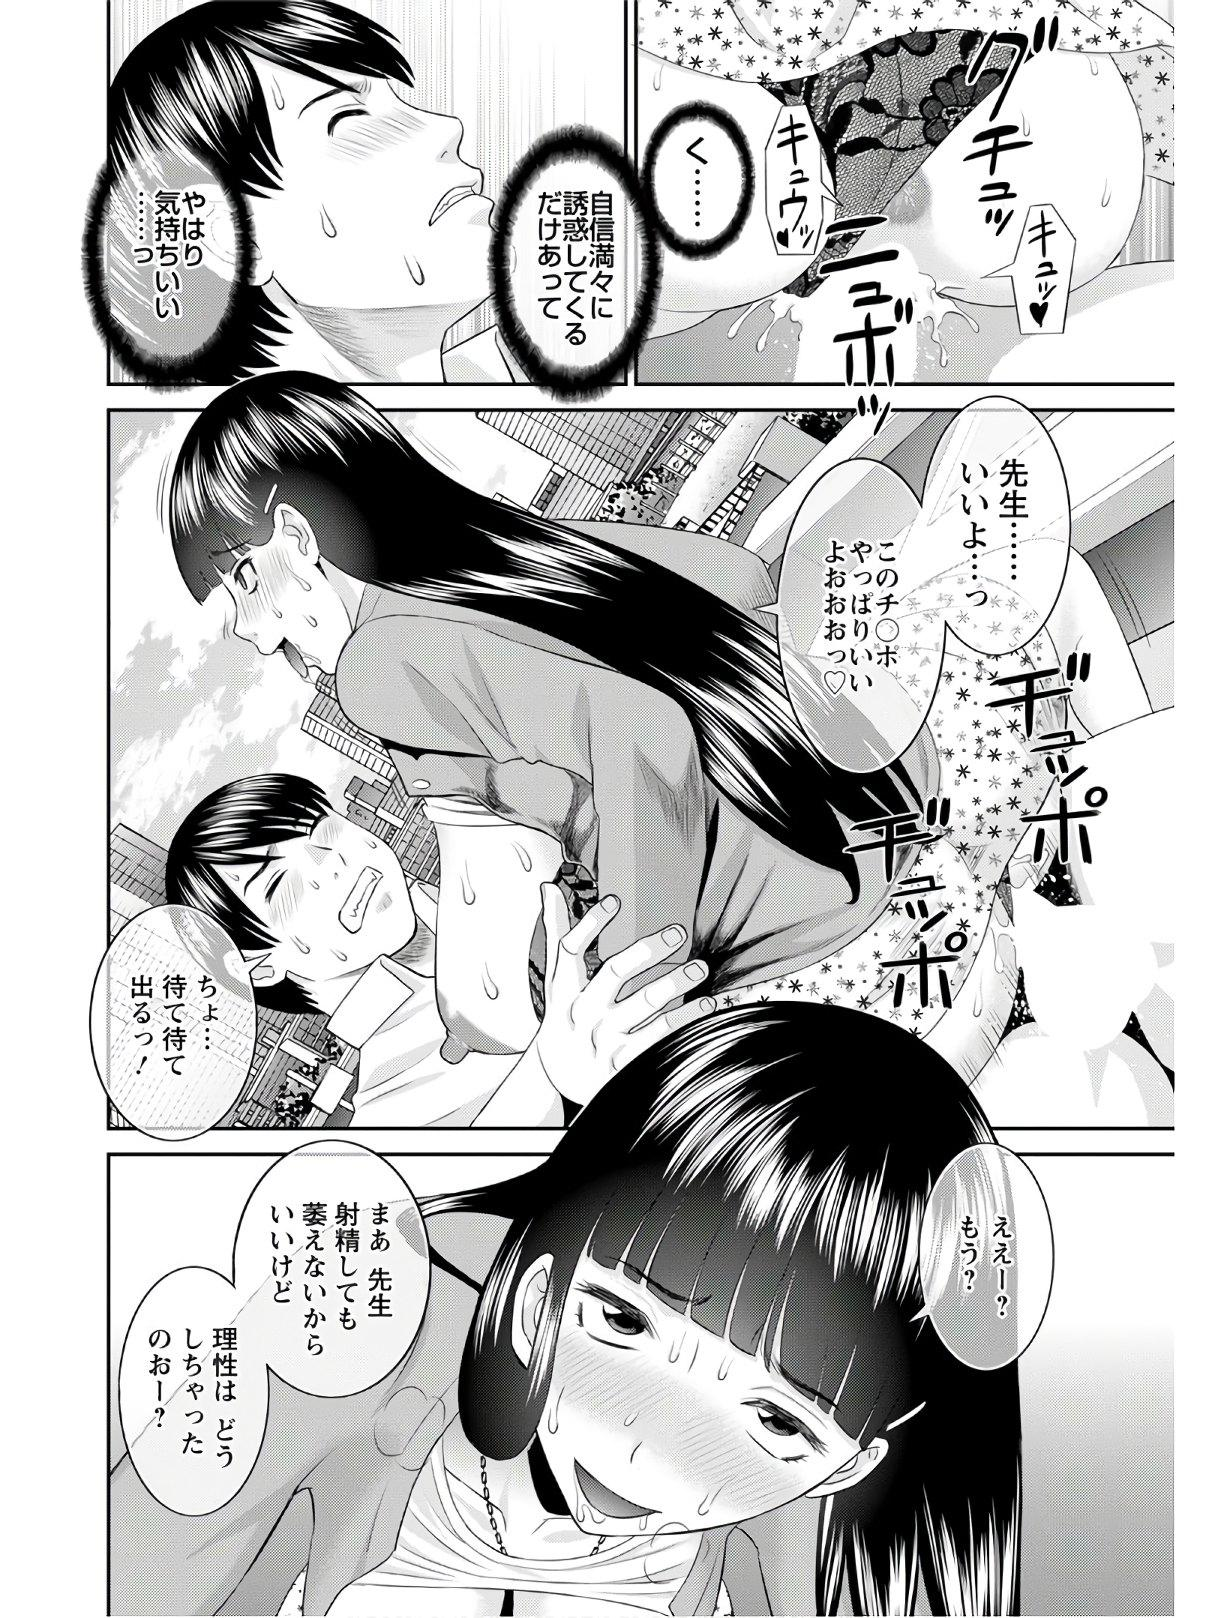 [Kawamori Misaki] Kaikan Hitotsuma Gakuen Ch. 1-6, 8-20 [Digital] 306